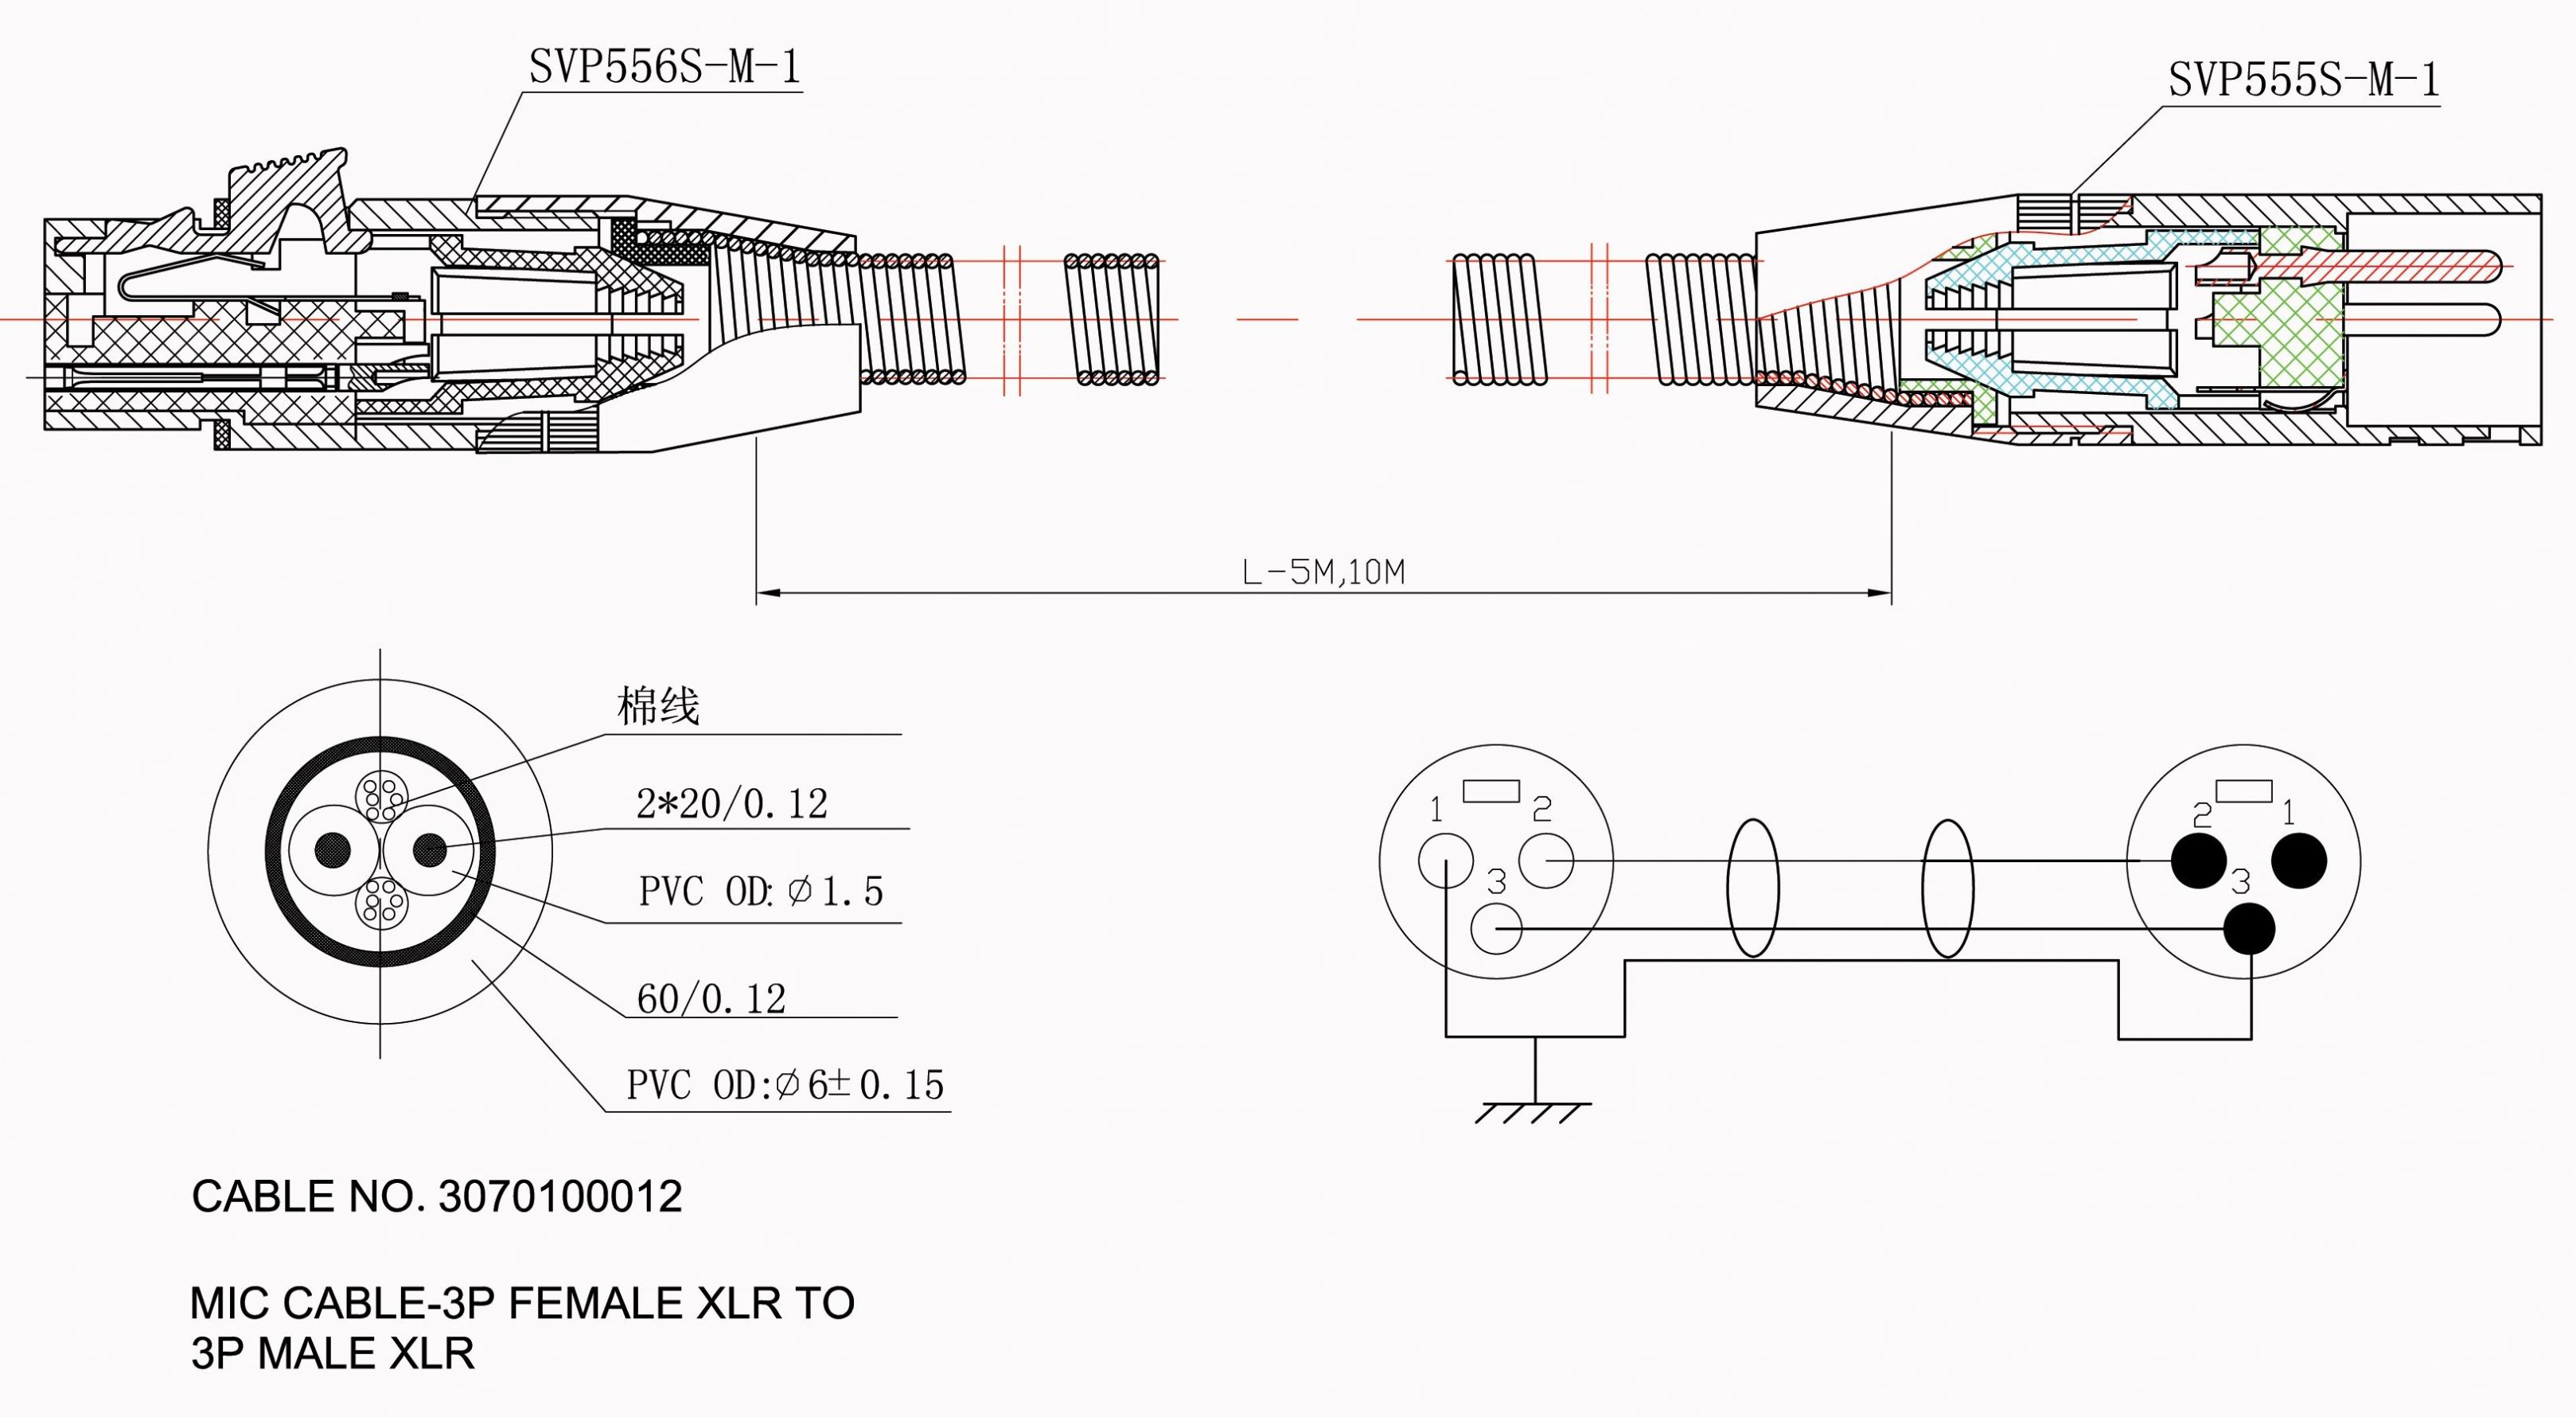 4 Prong Generator Diagram | Wiring Diagram - 4 Prong Generator Plug Wiring Diagram